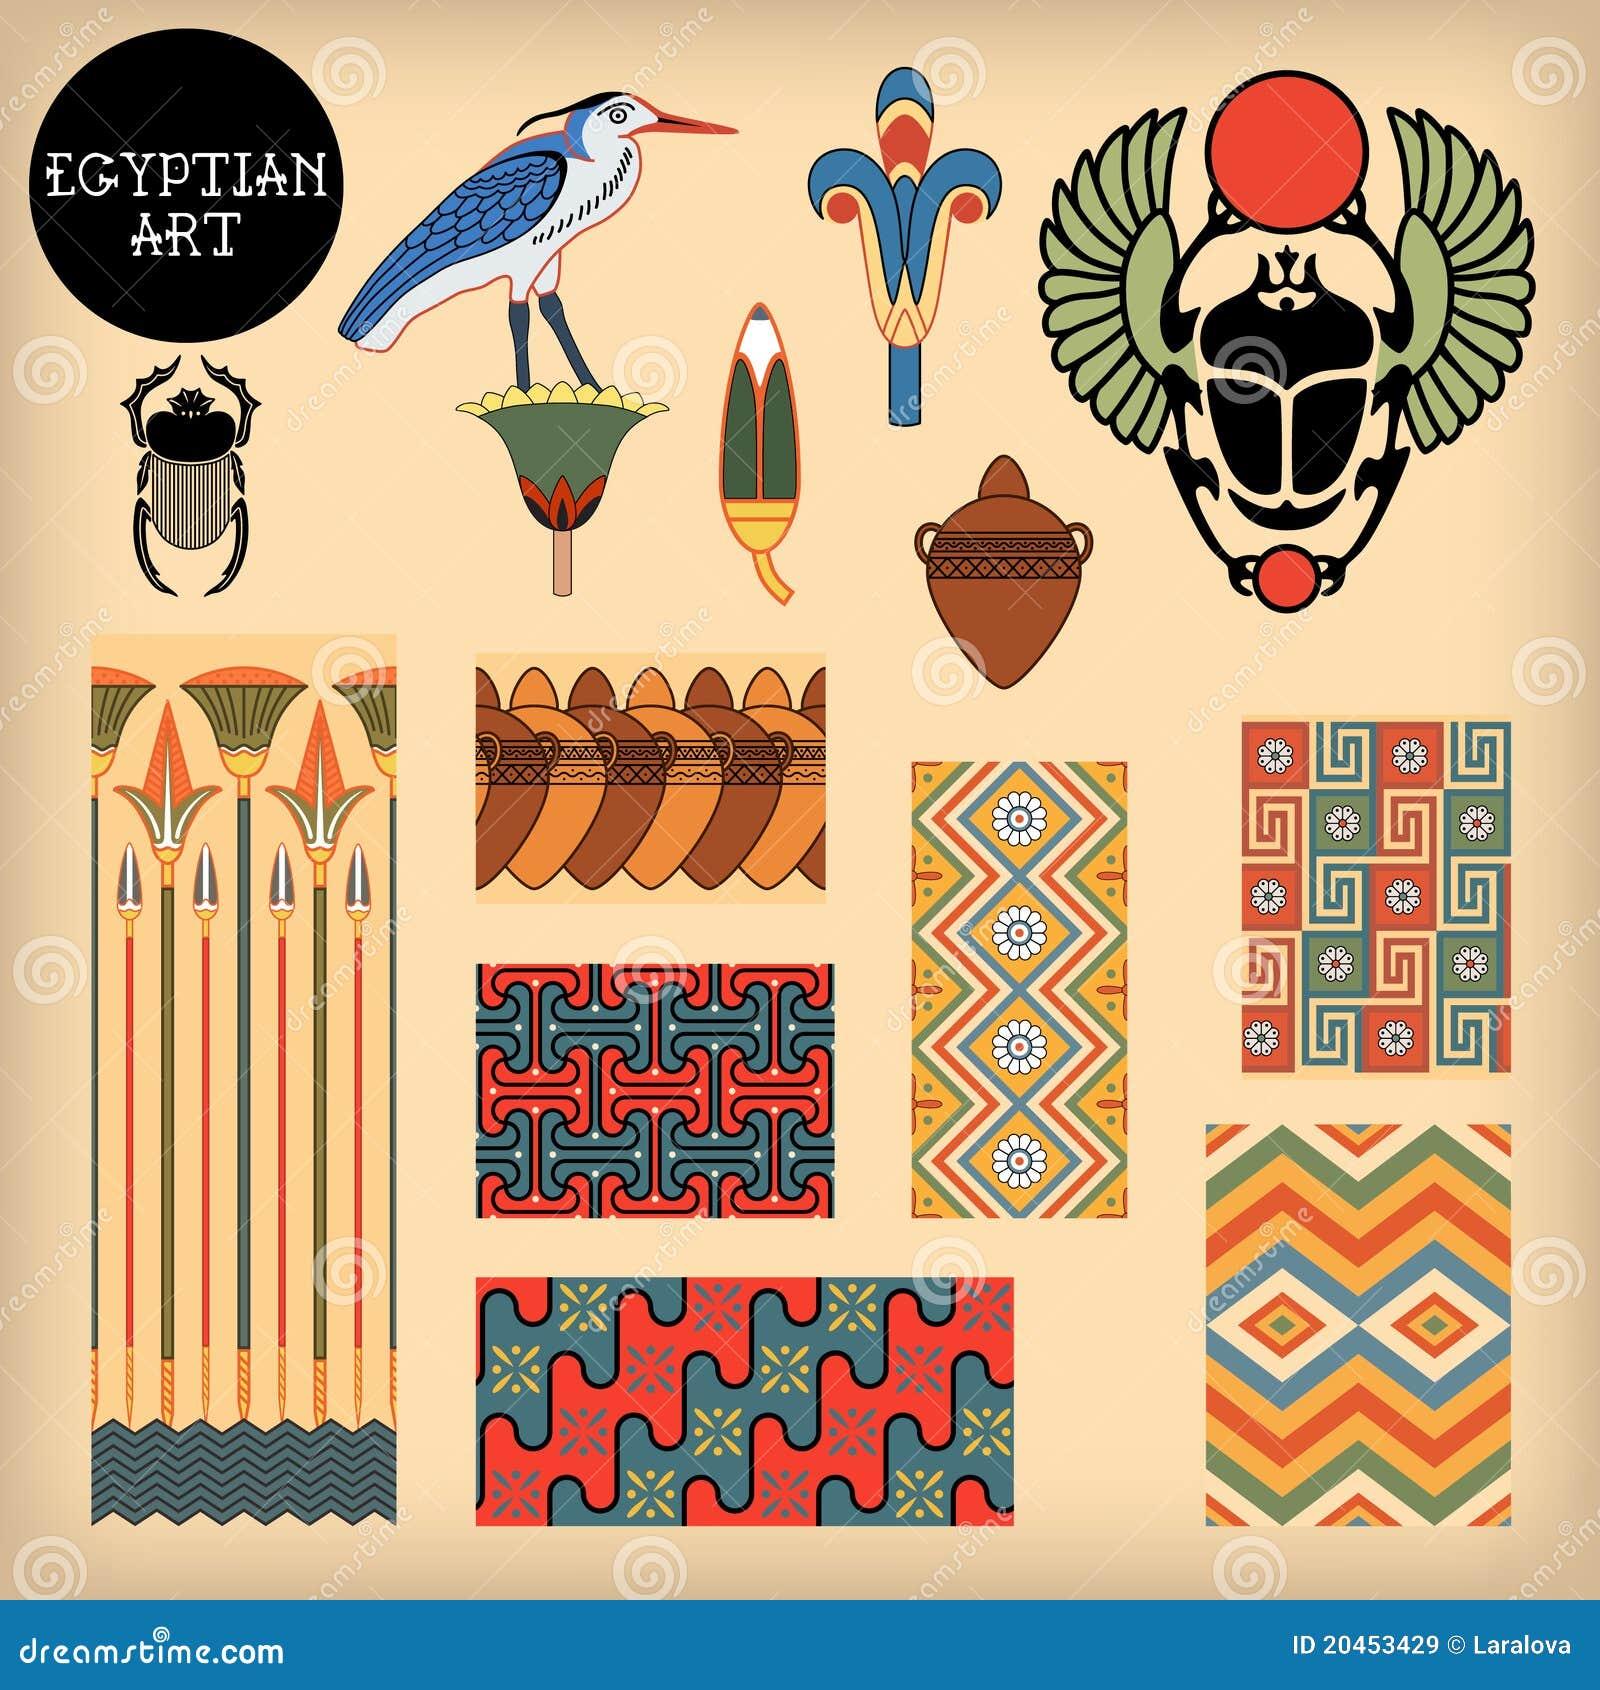 Egyptian Art Royalty Free Stock Images Image 20453429